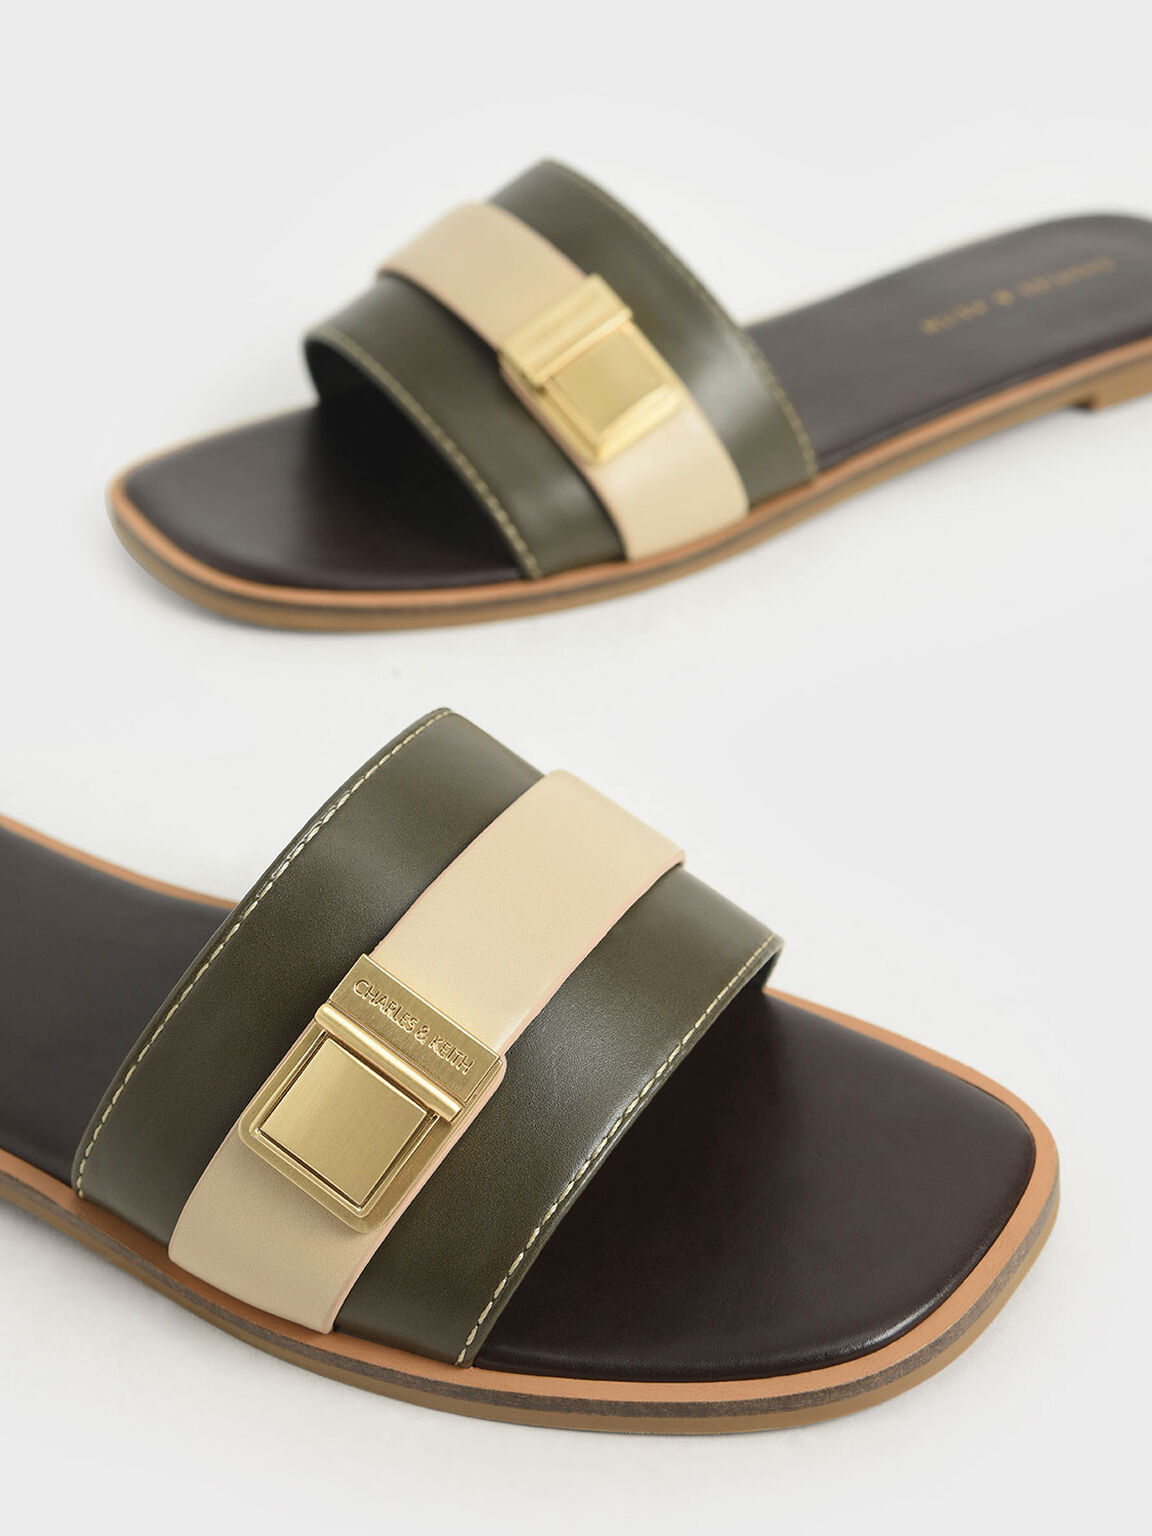 Buckle Detail Slide Sandals, Dark Brown, hi-res